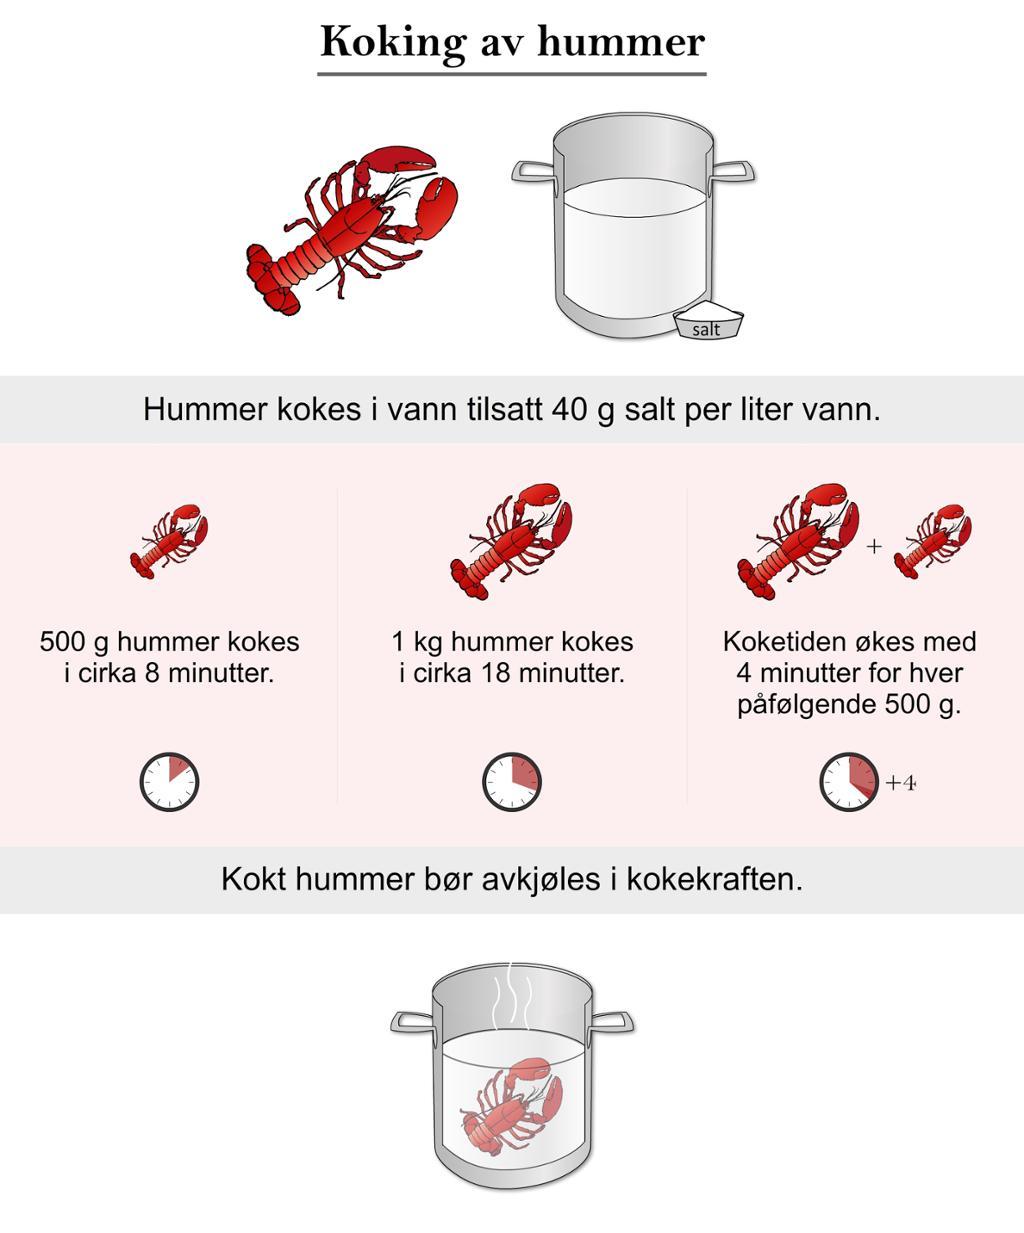 Koking av hummer